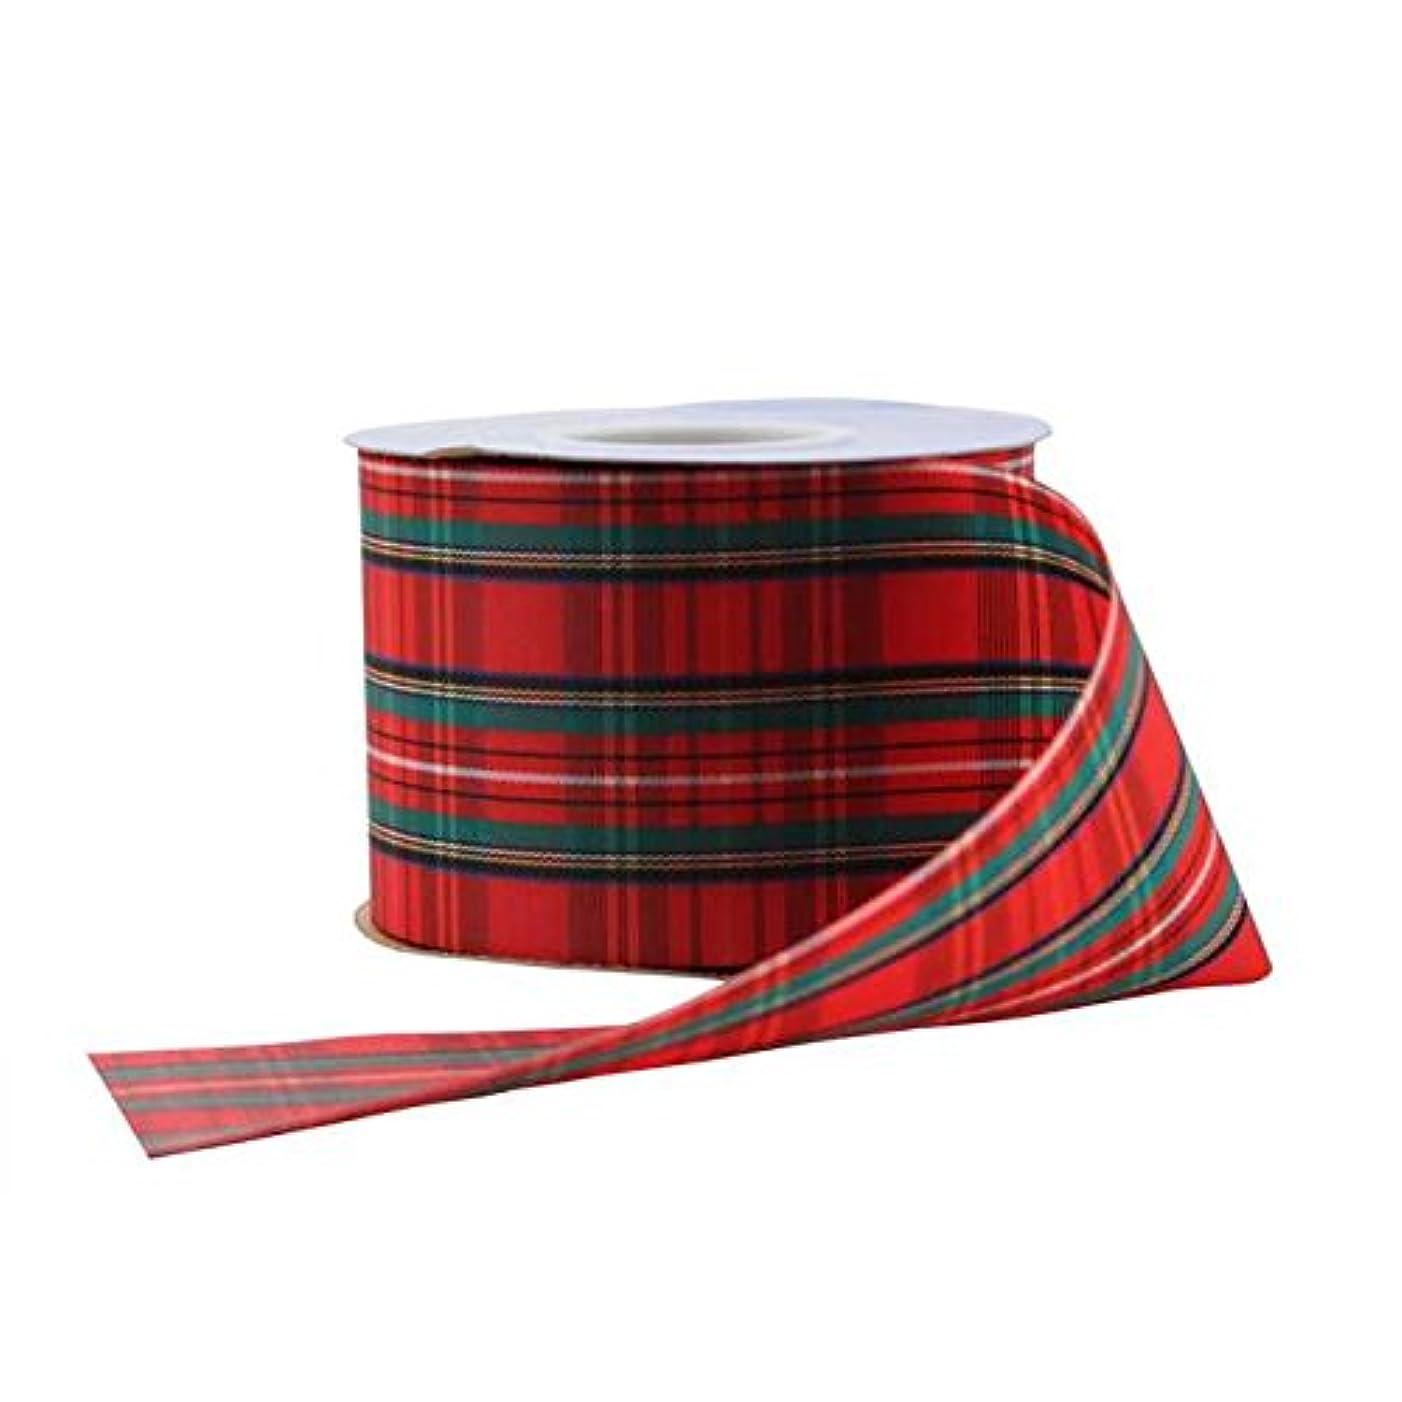 Berwick Offray Stewart Plaid Ribbon-2-1/2 Wide X 25 Yards-Red Ribbon